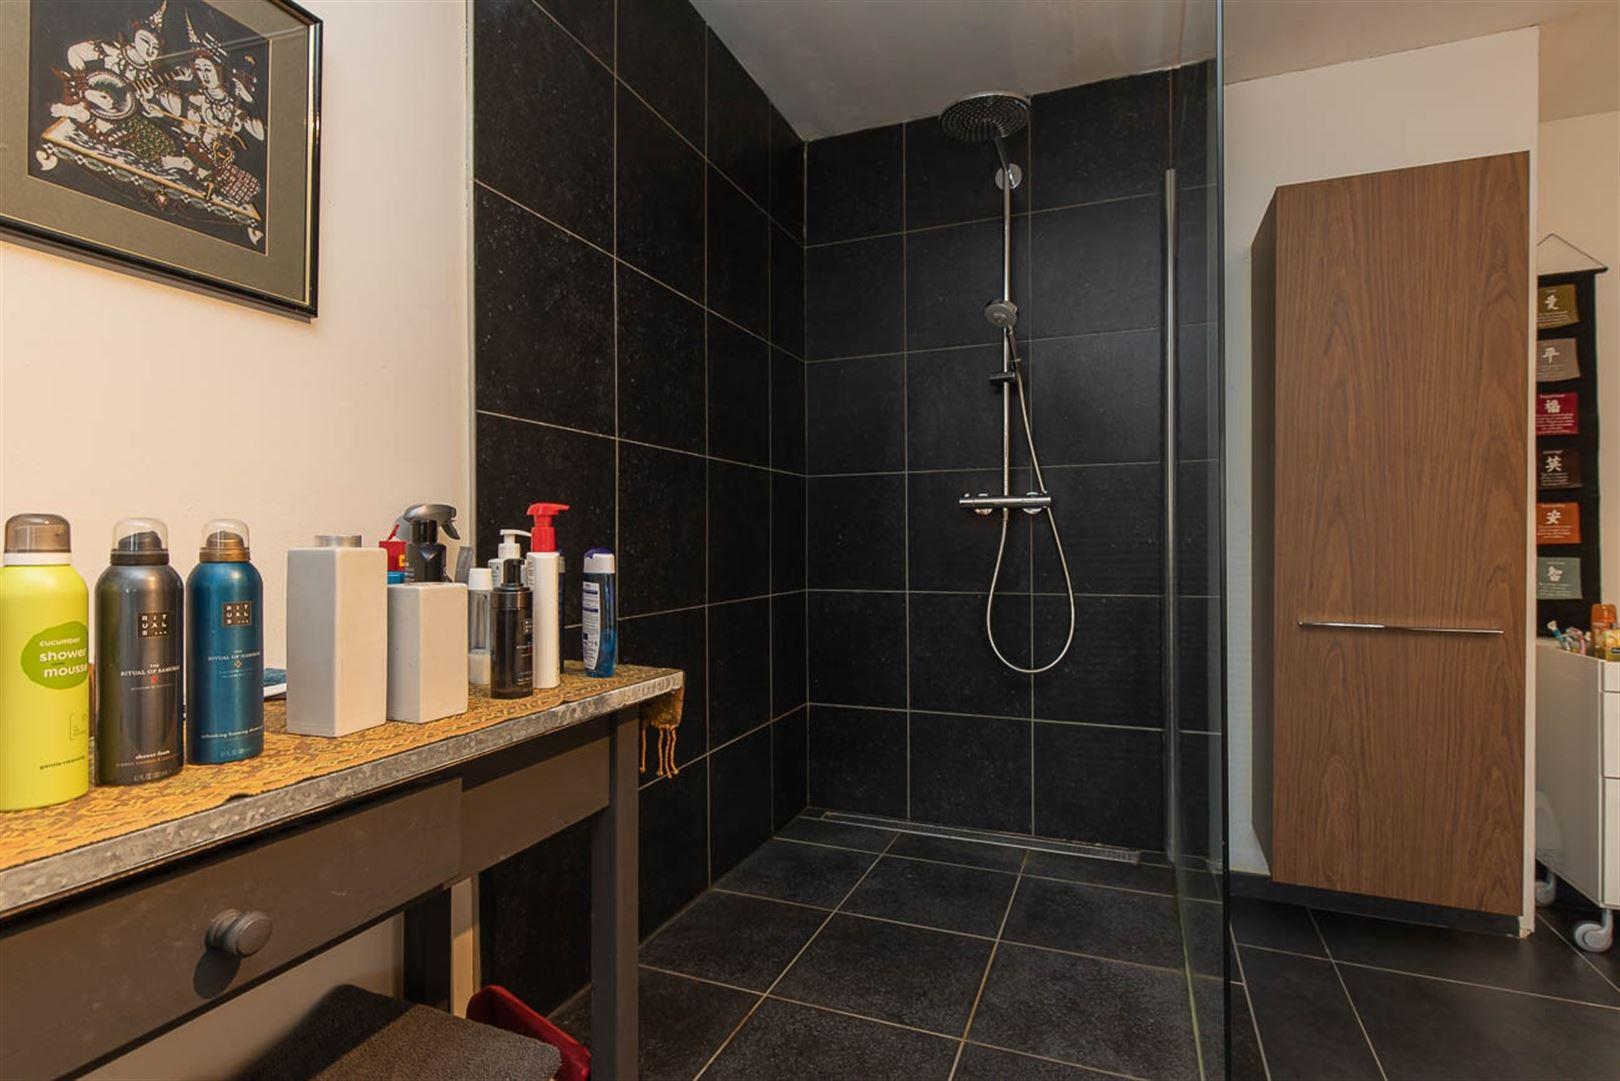 Foto 24 : Duplex/triplex te 9200 DENDERMONDE (België) - Prijs € 495.000